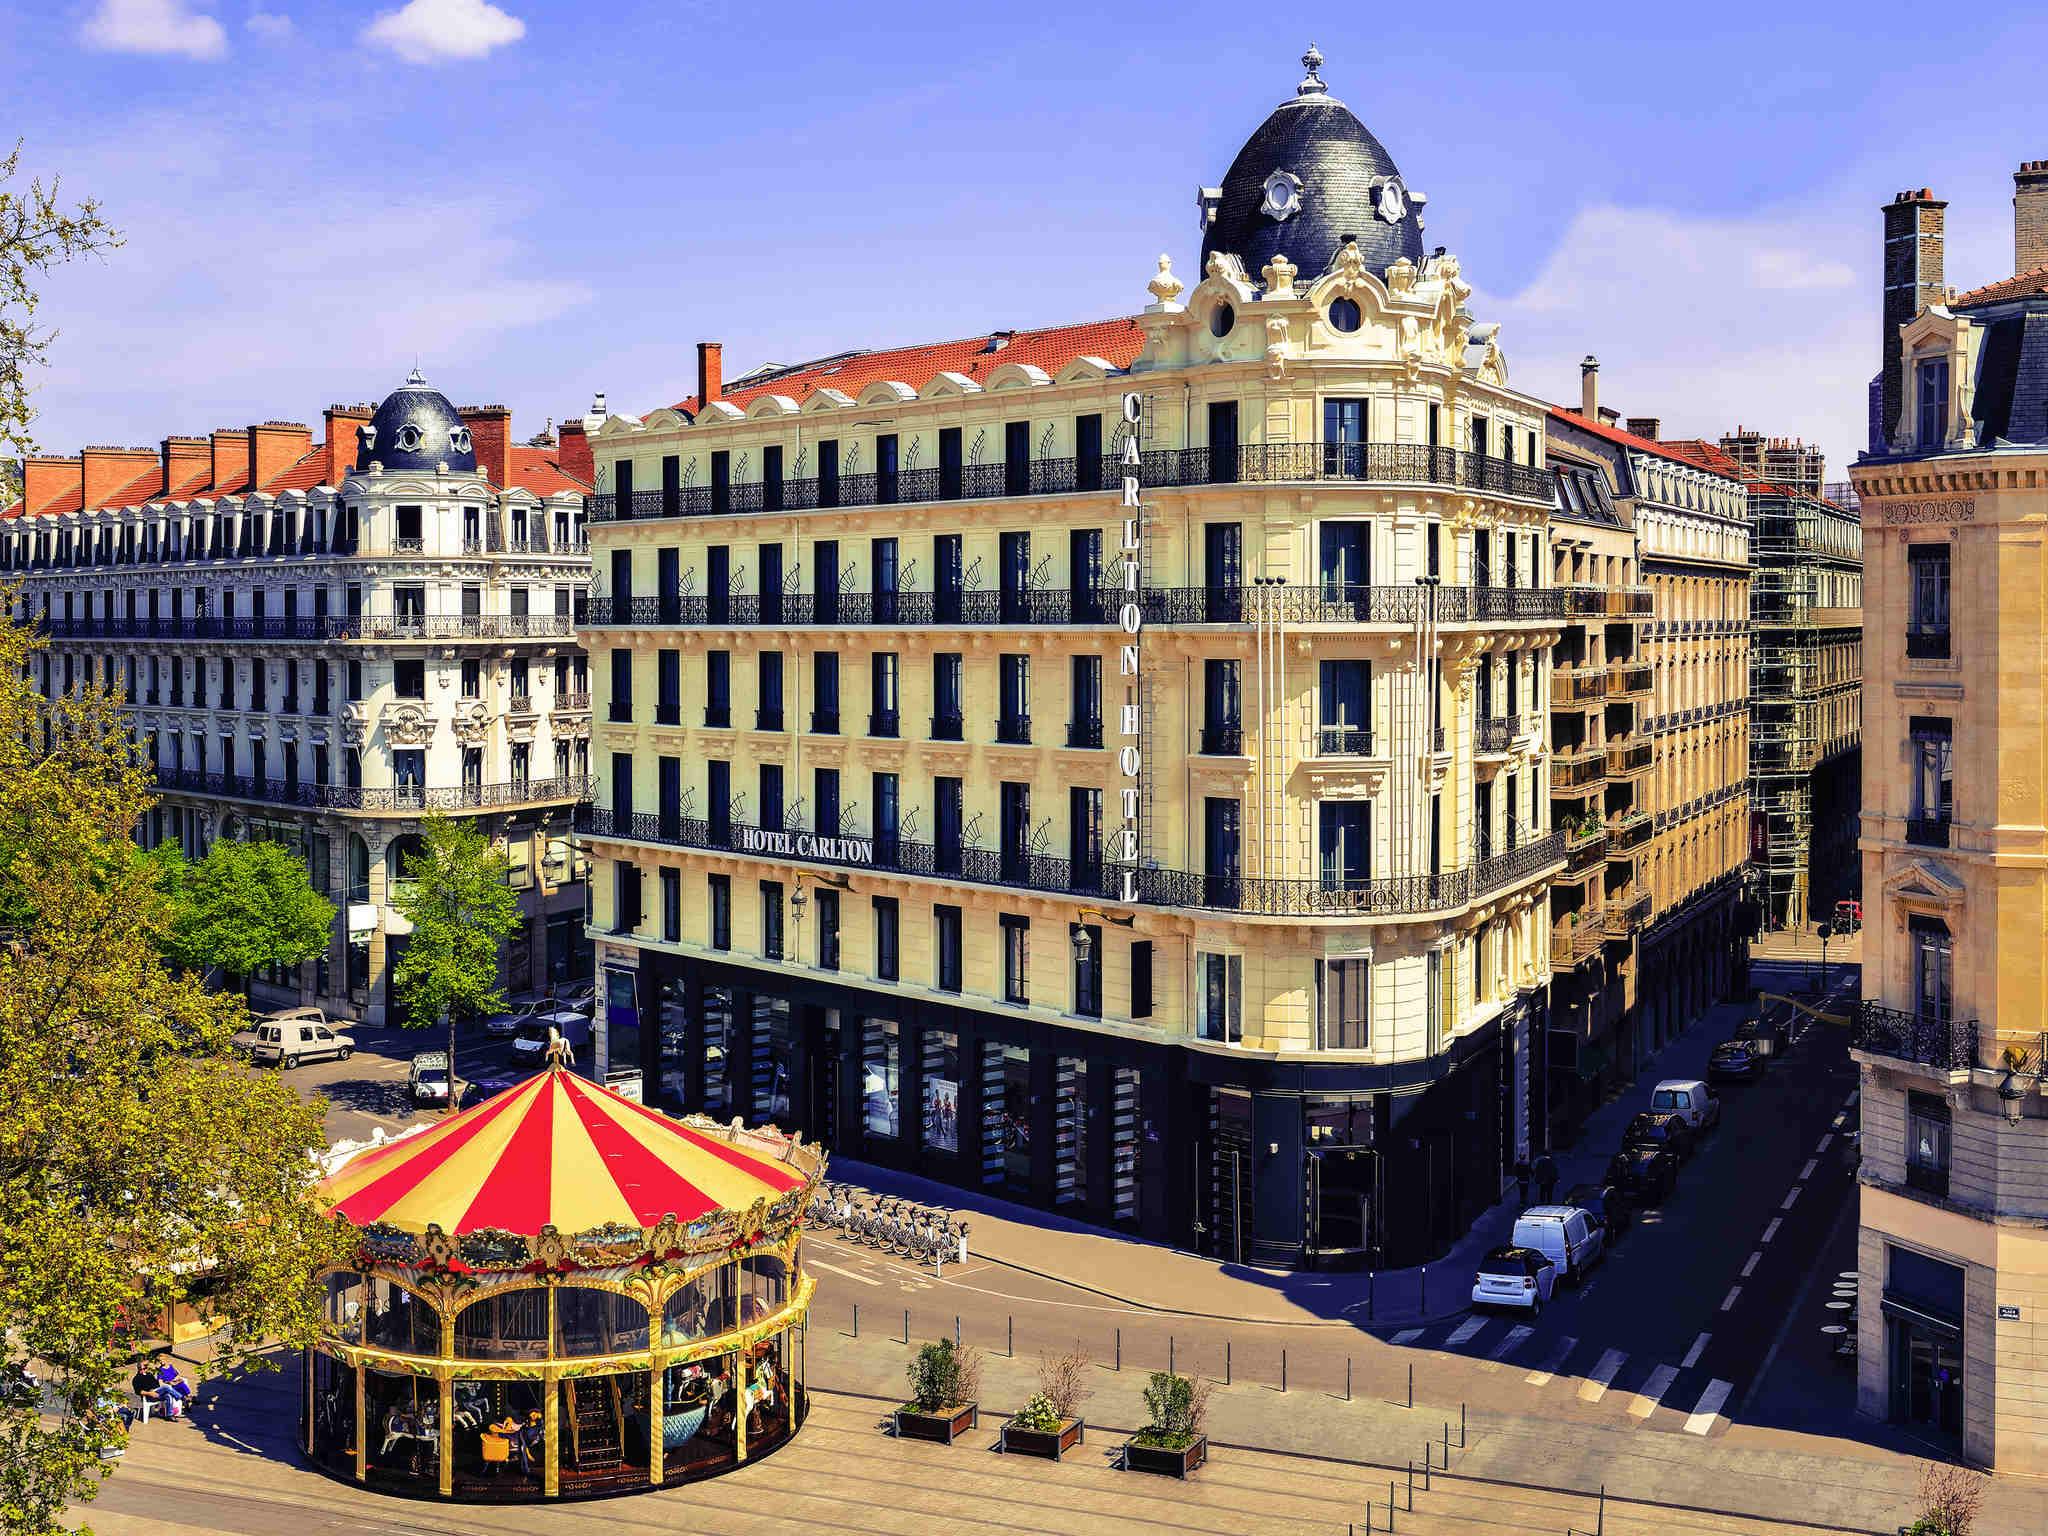 فندق - Hôtel Carlton Lyon - MGallery by Sofitel